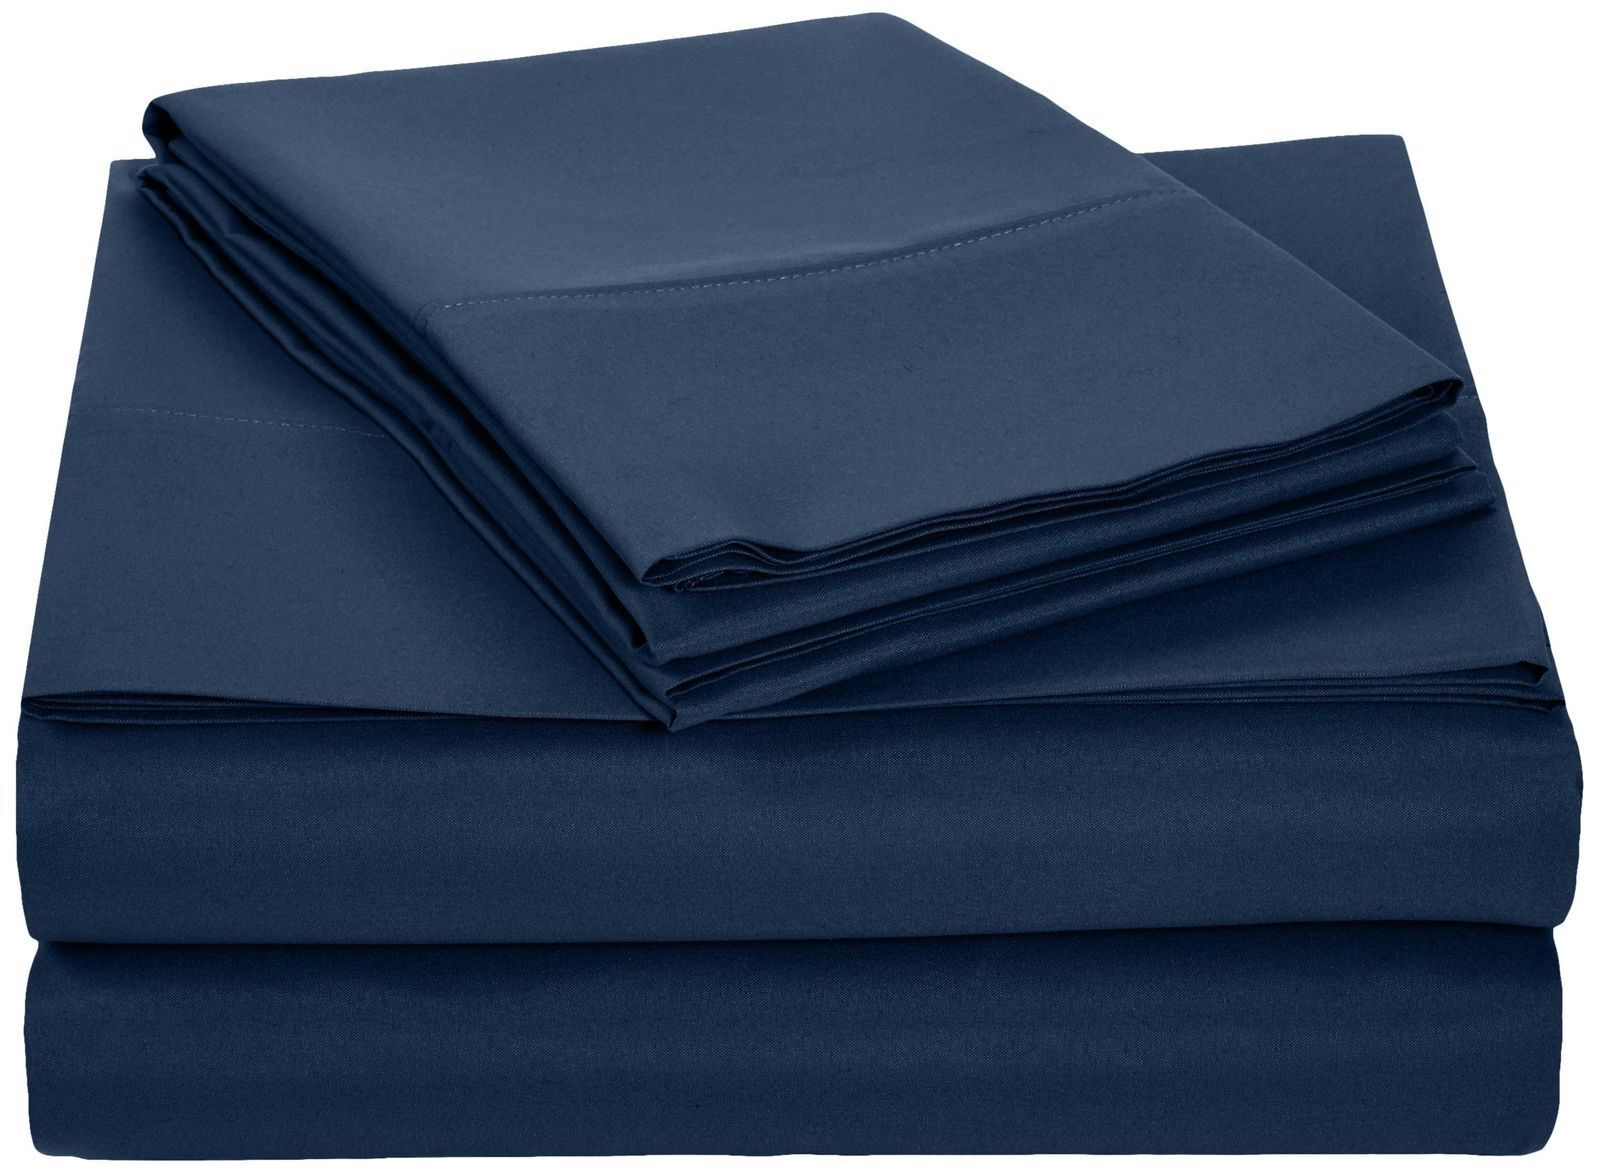 AmazonBasics Microfiber Sheet Set - Full, Navy Blue